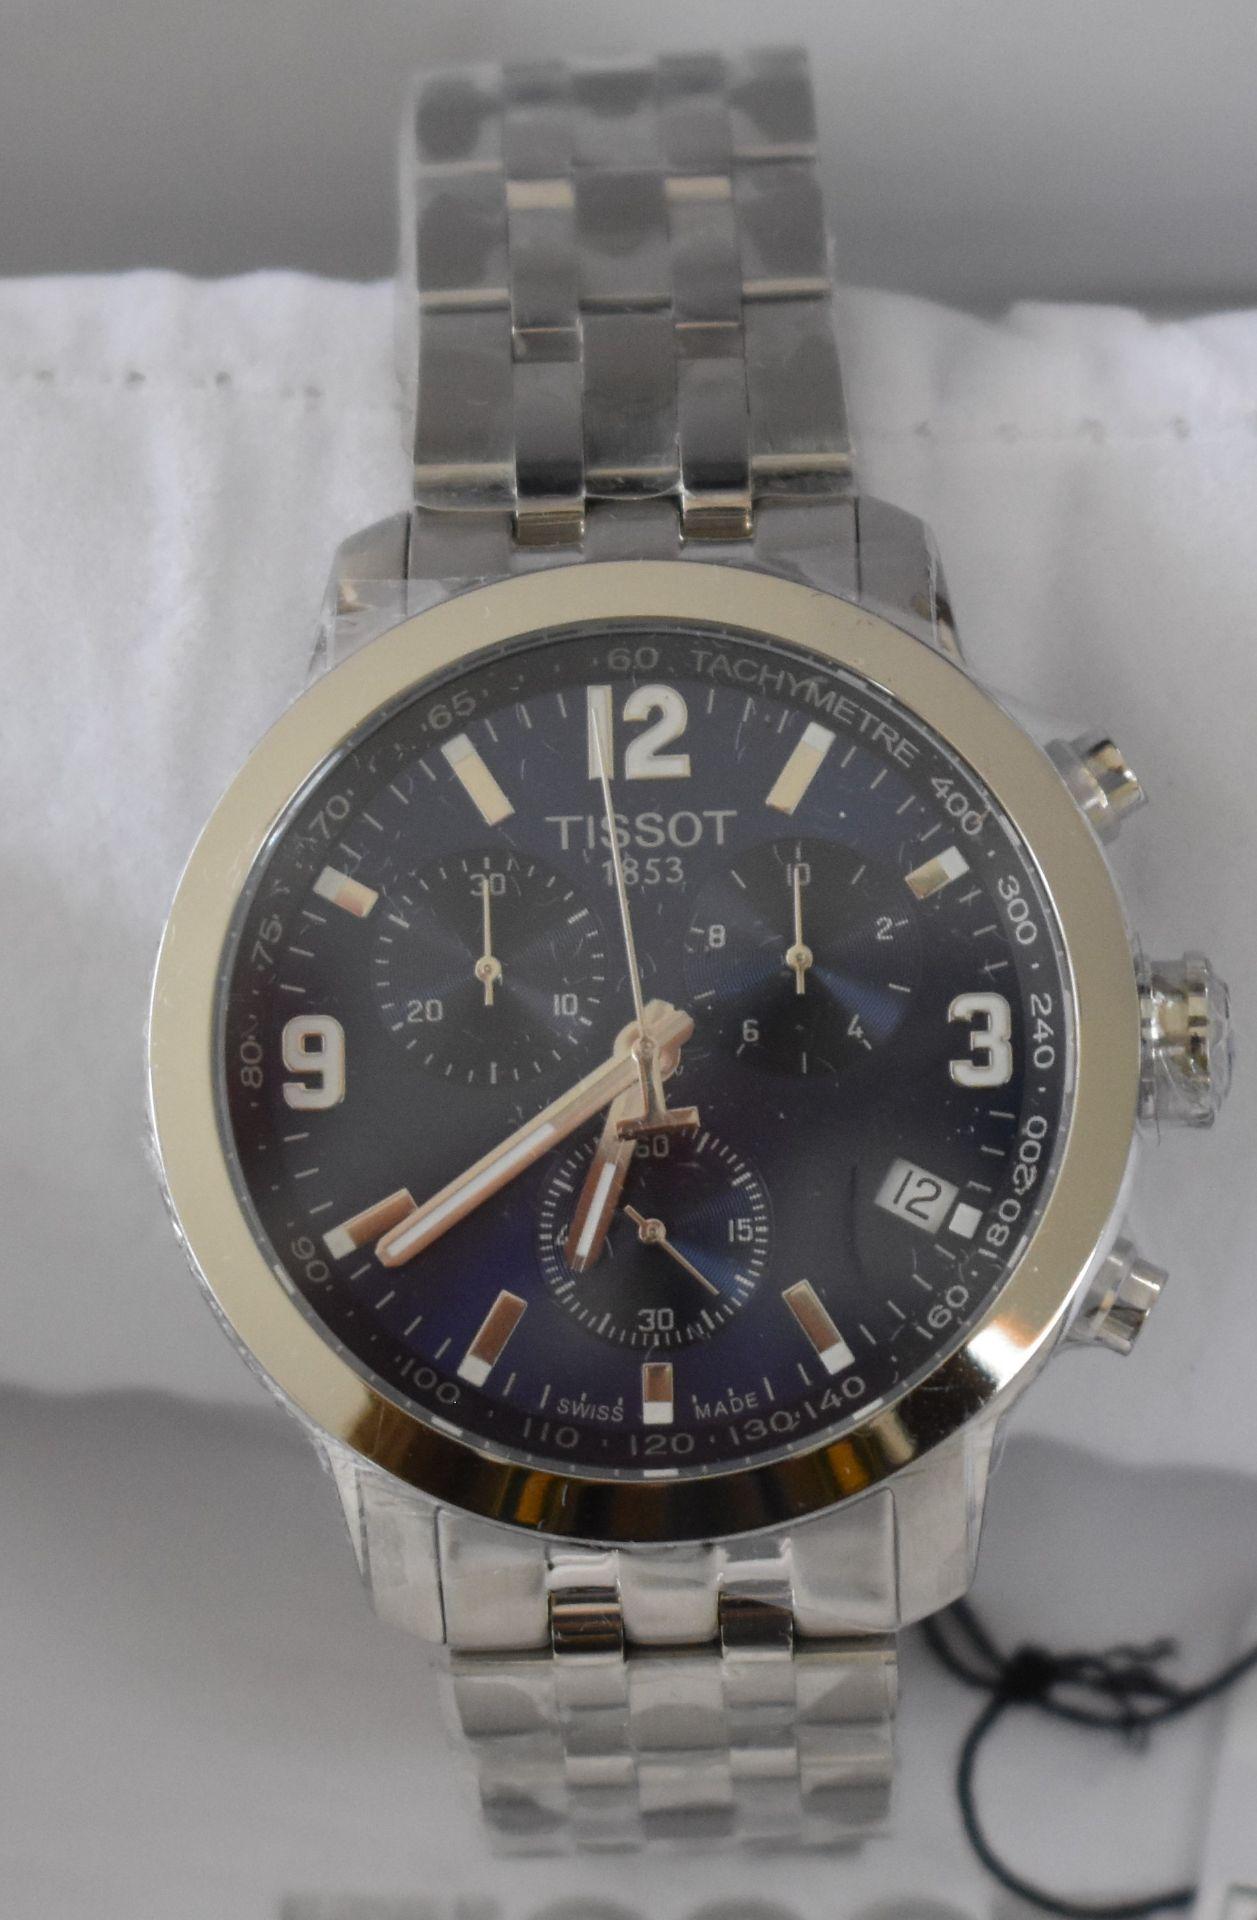 Tissot Men's Watch TO55.417.11.047.00 - Image 3 of 3